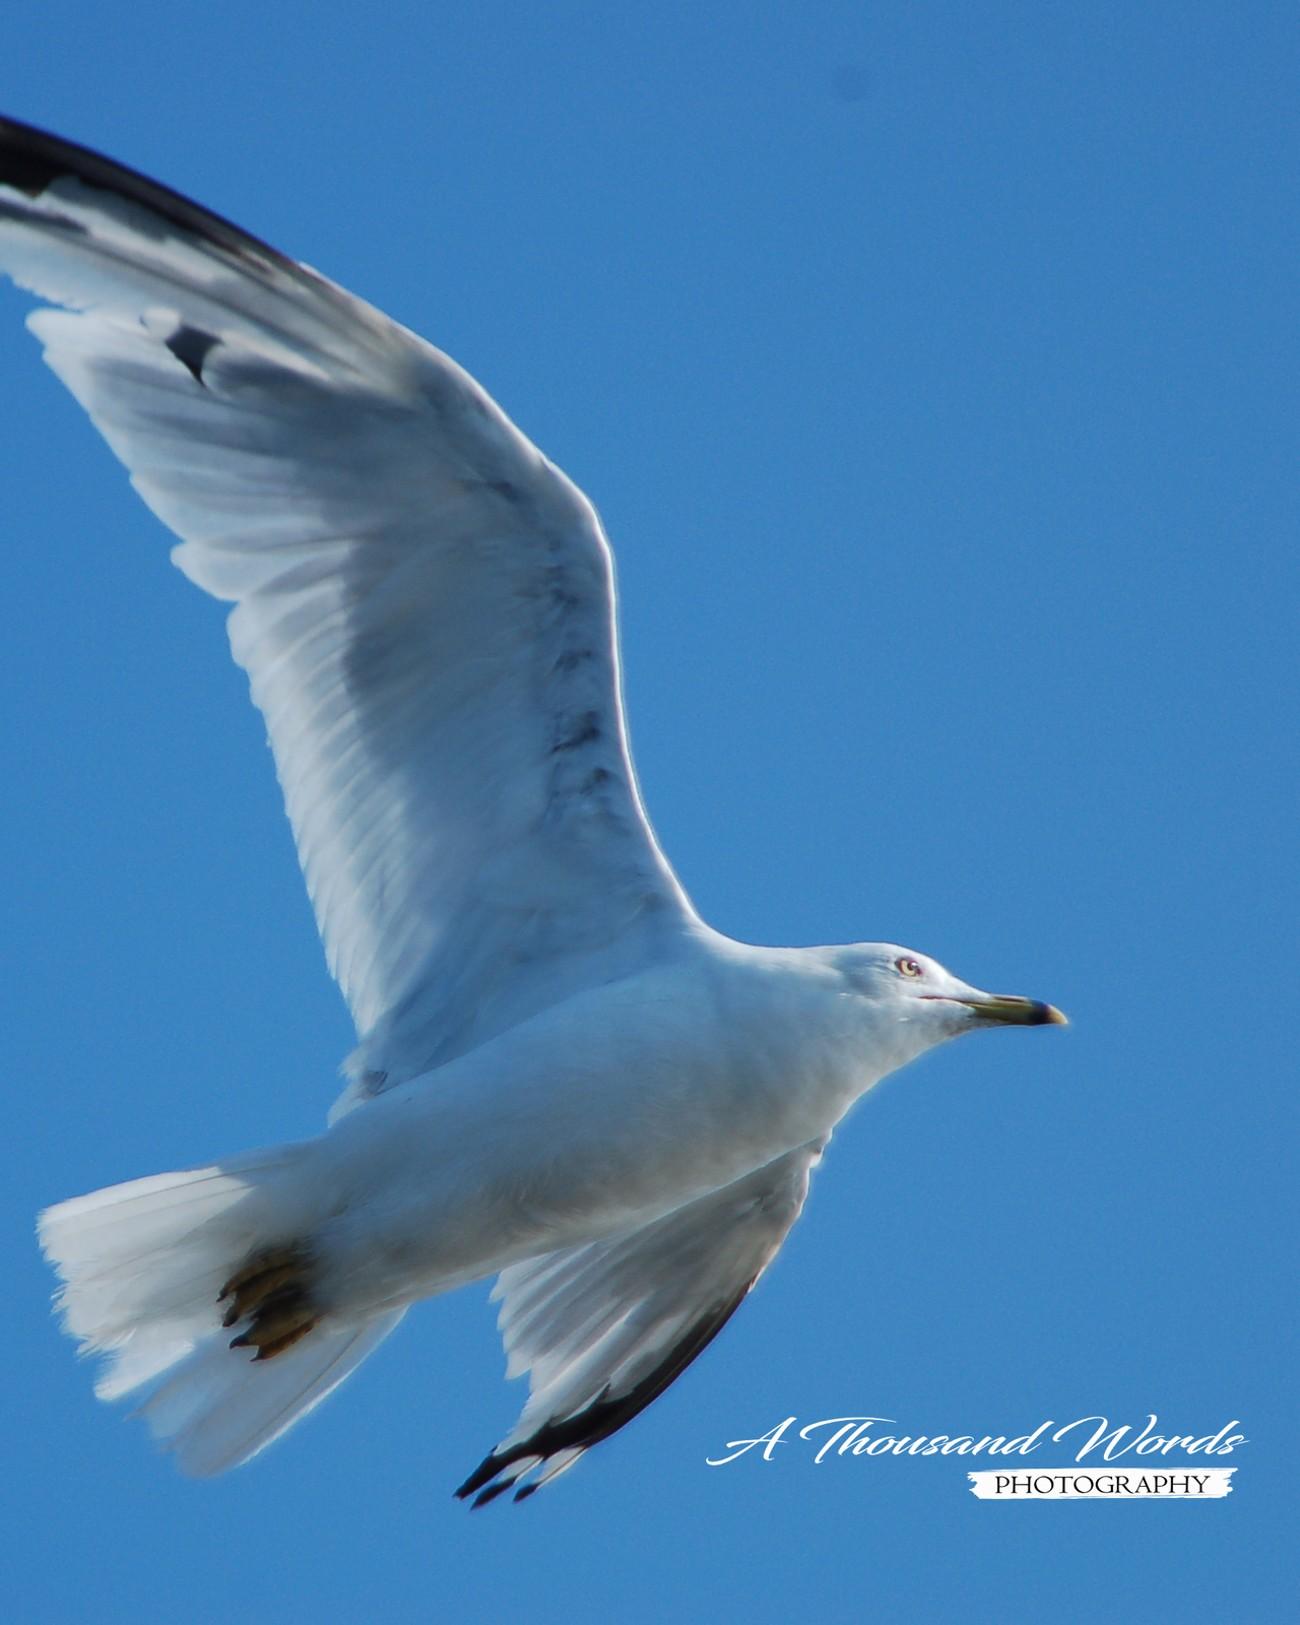 Seagull captured mid flight.